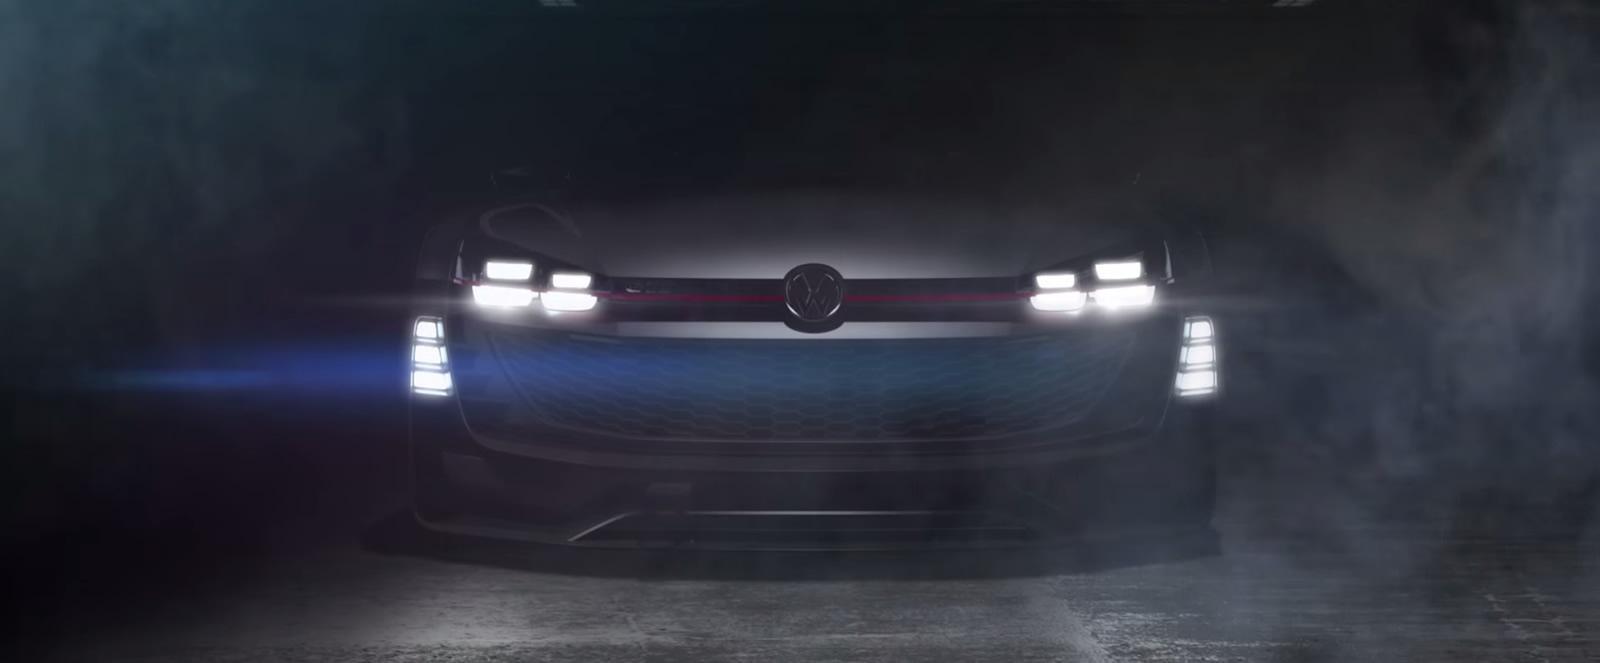 VW выпустил тизер GTI Supersport Vision Gran Turismo